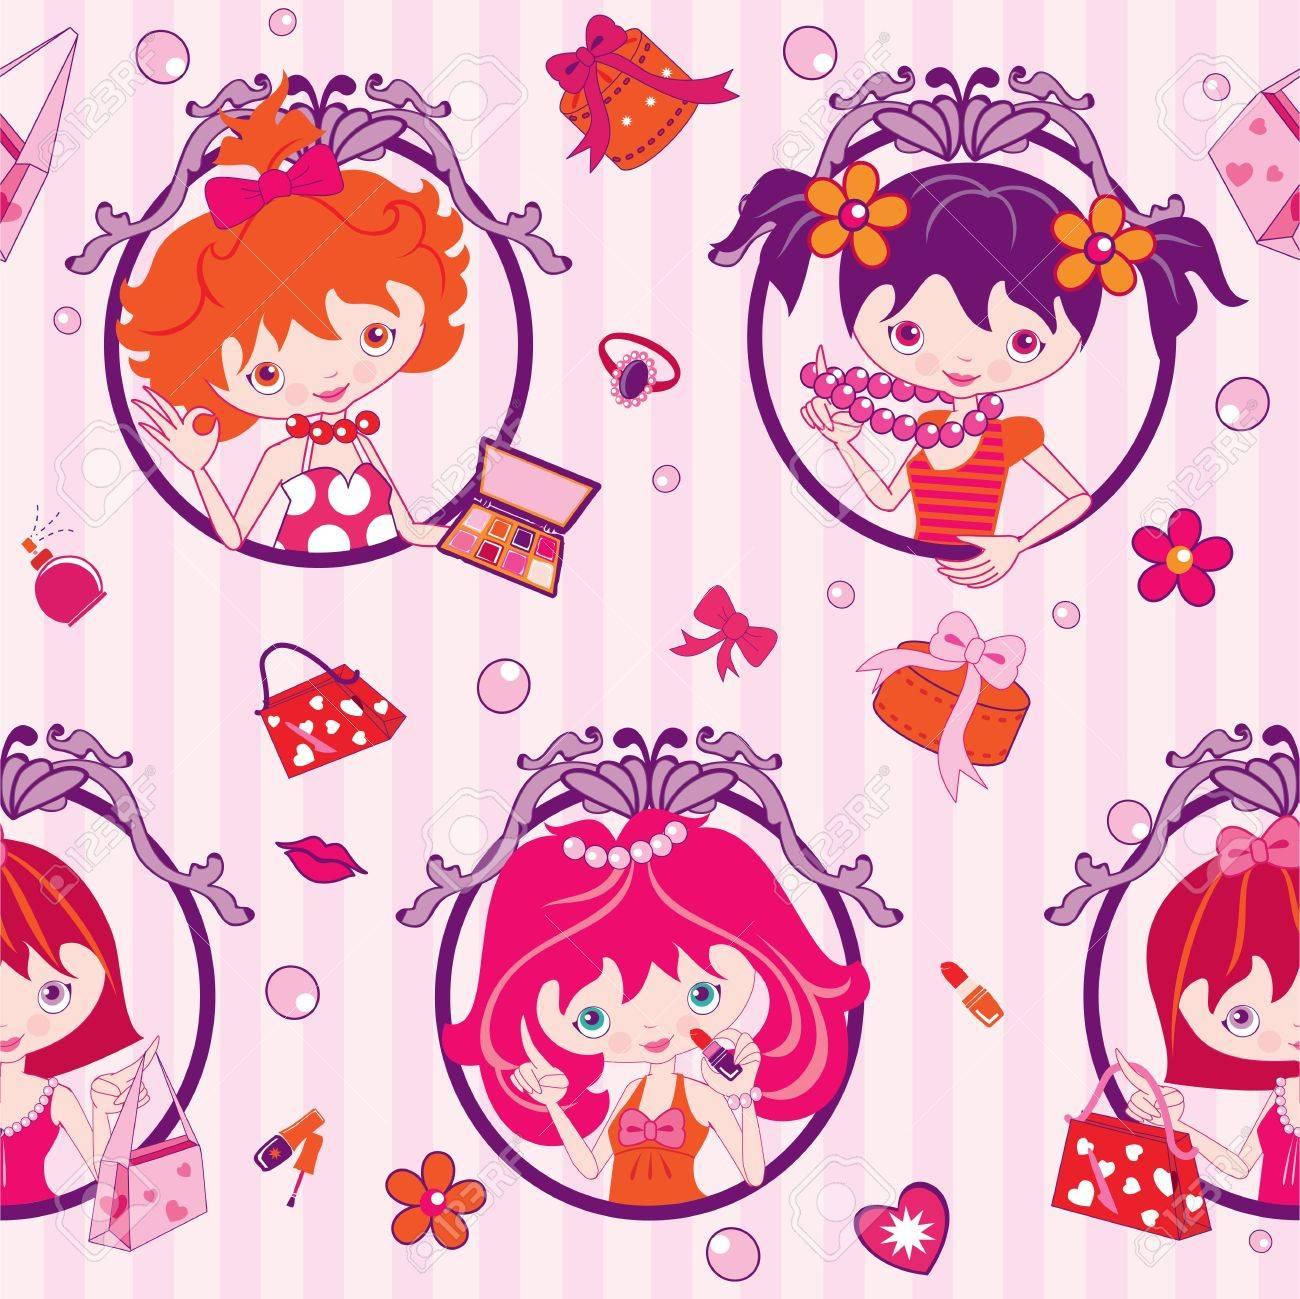 pink cartoon girls, makeup and jewelry - illustration - 14410186